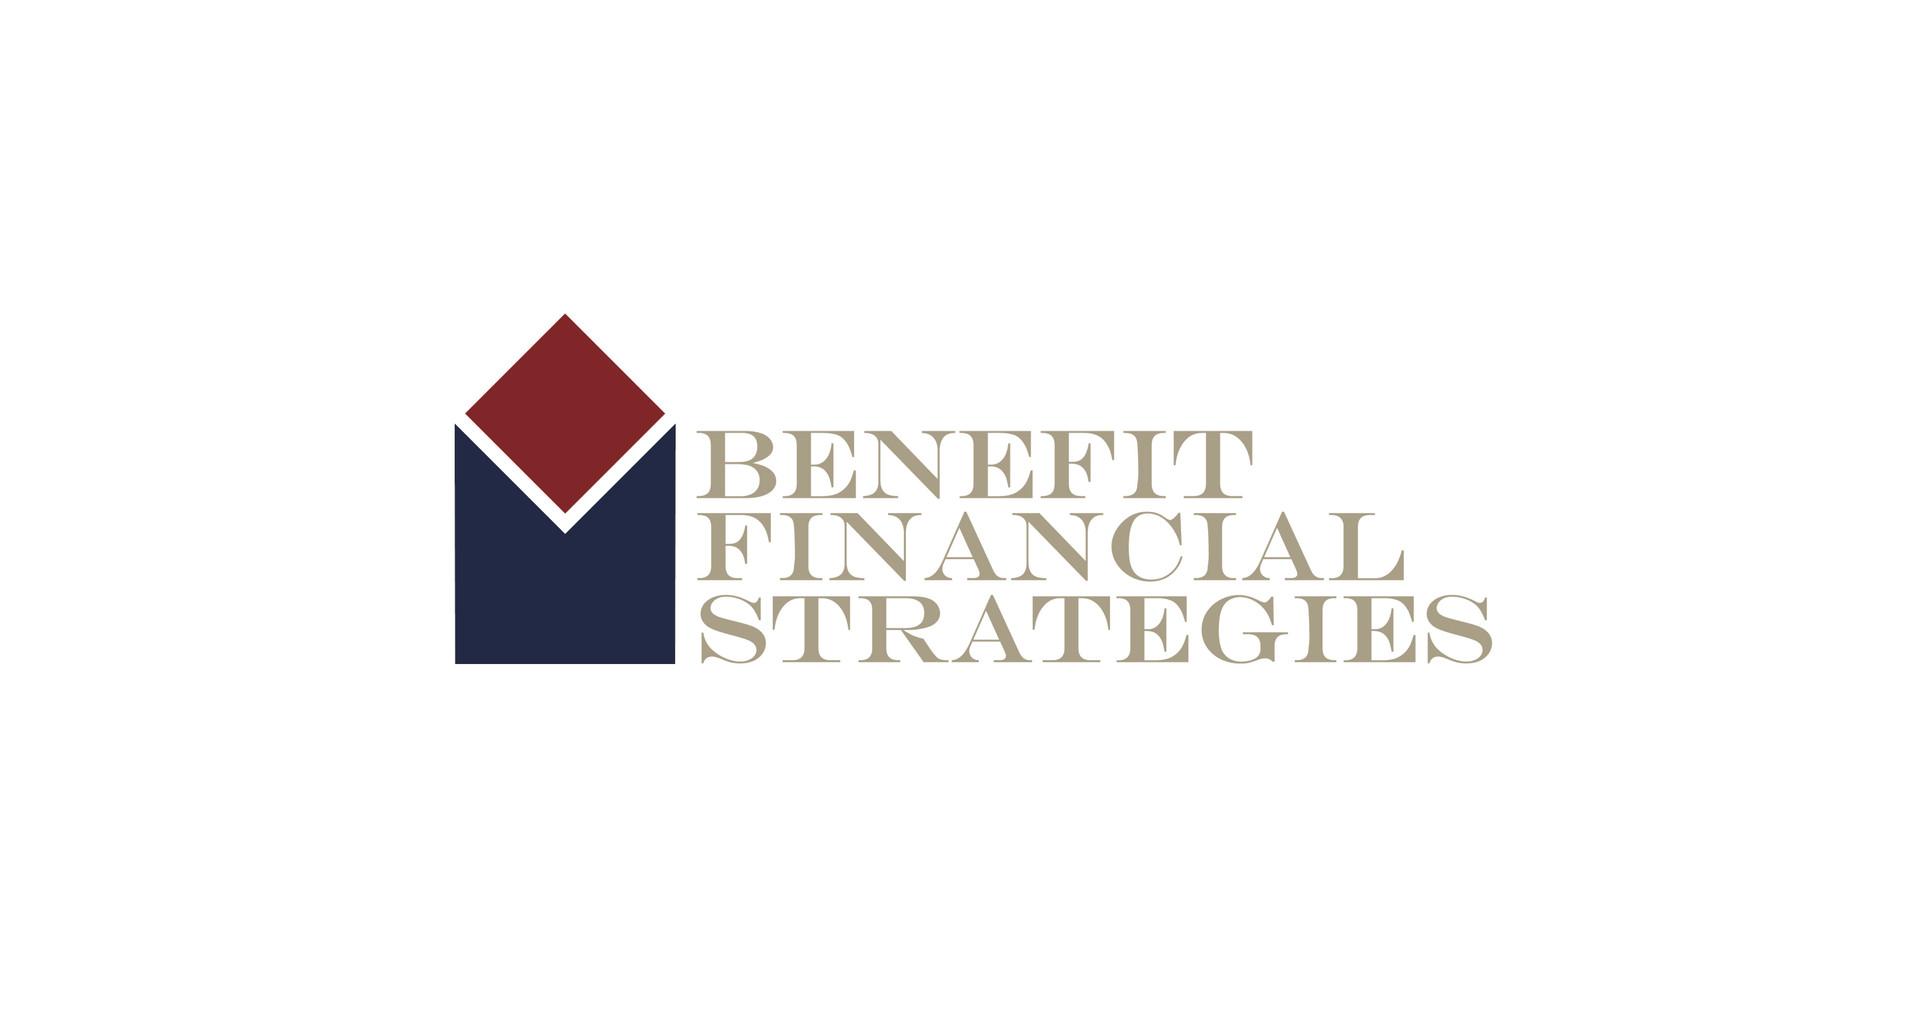 Benefit Financial Strategies